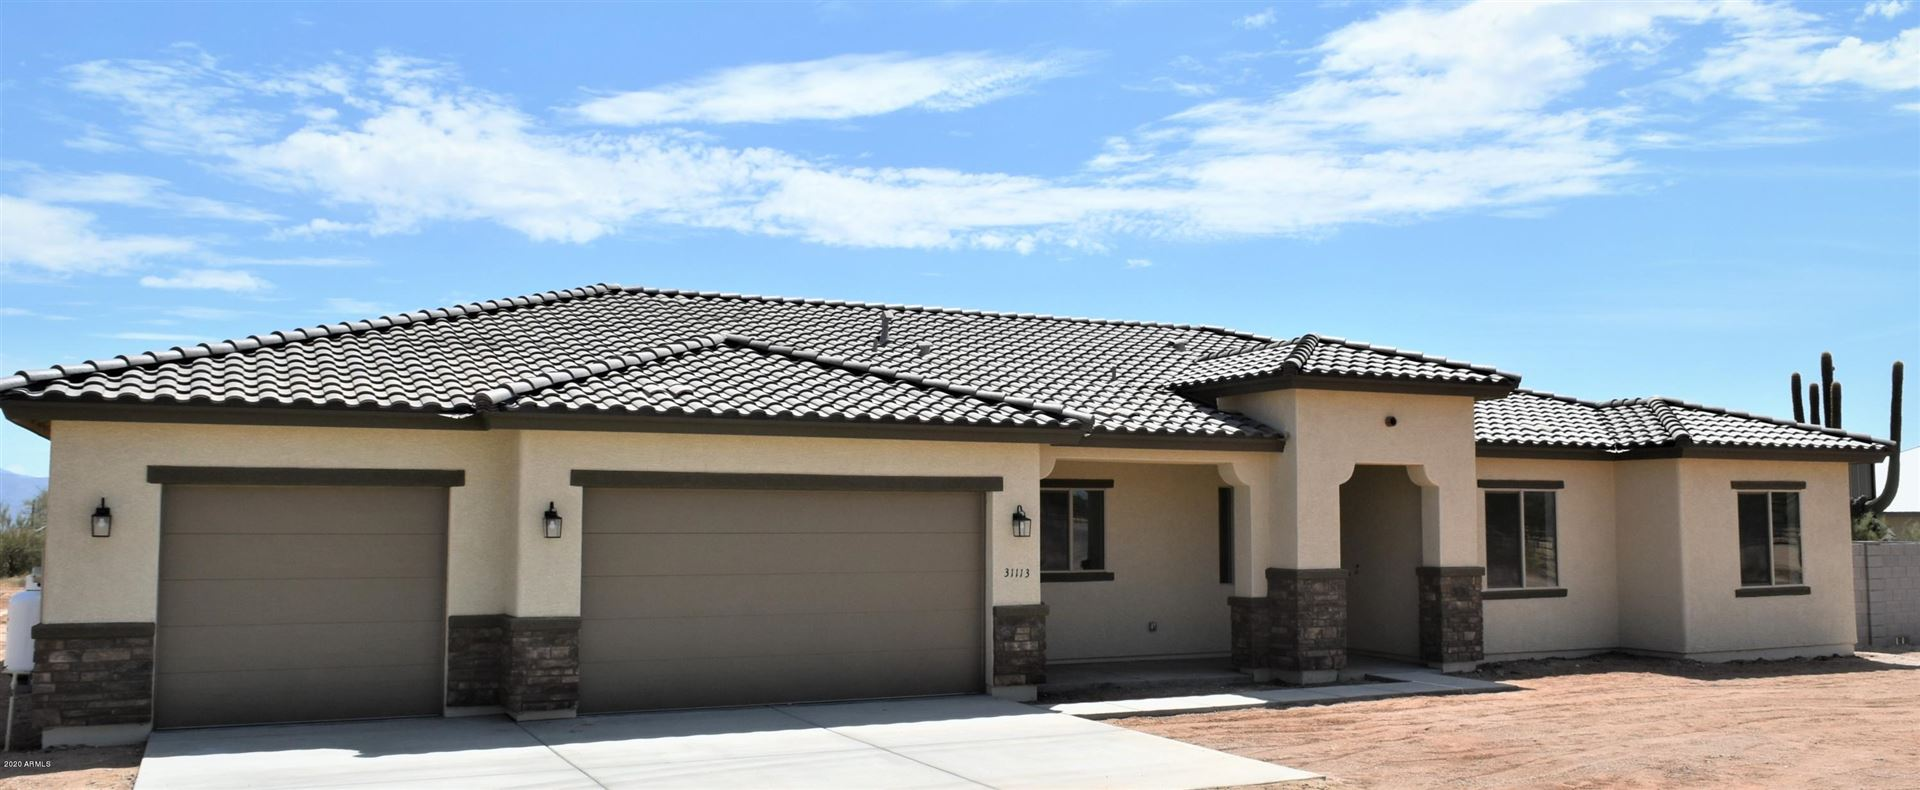 805 E Perdido Way, Phoenix, AZ 85086 - MLS#: 6106383